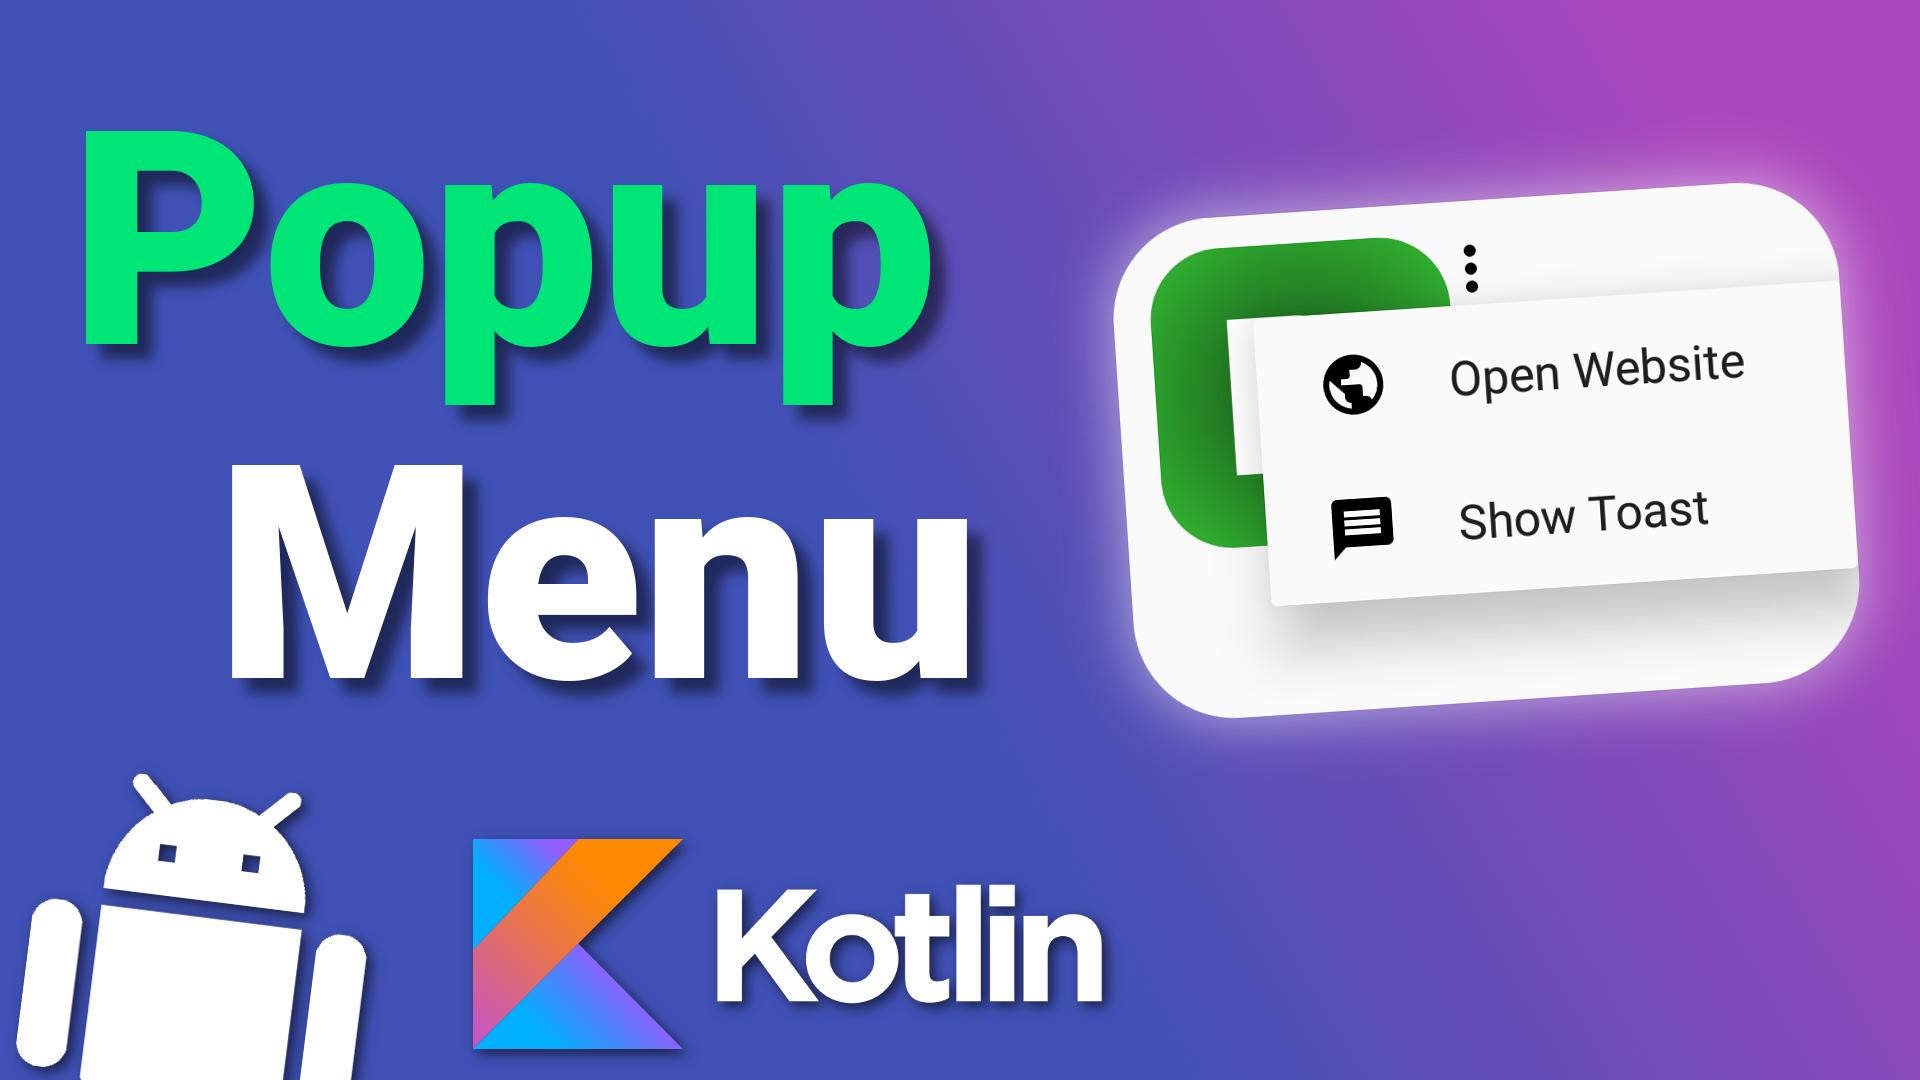 Popup Menu Android Kotlin